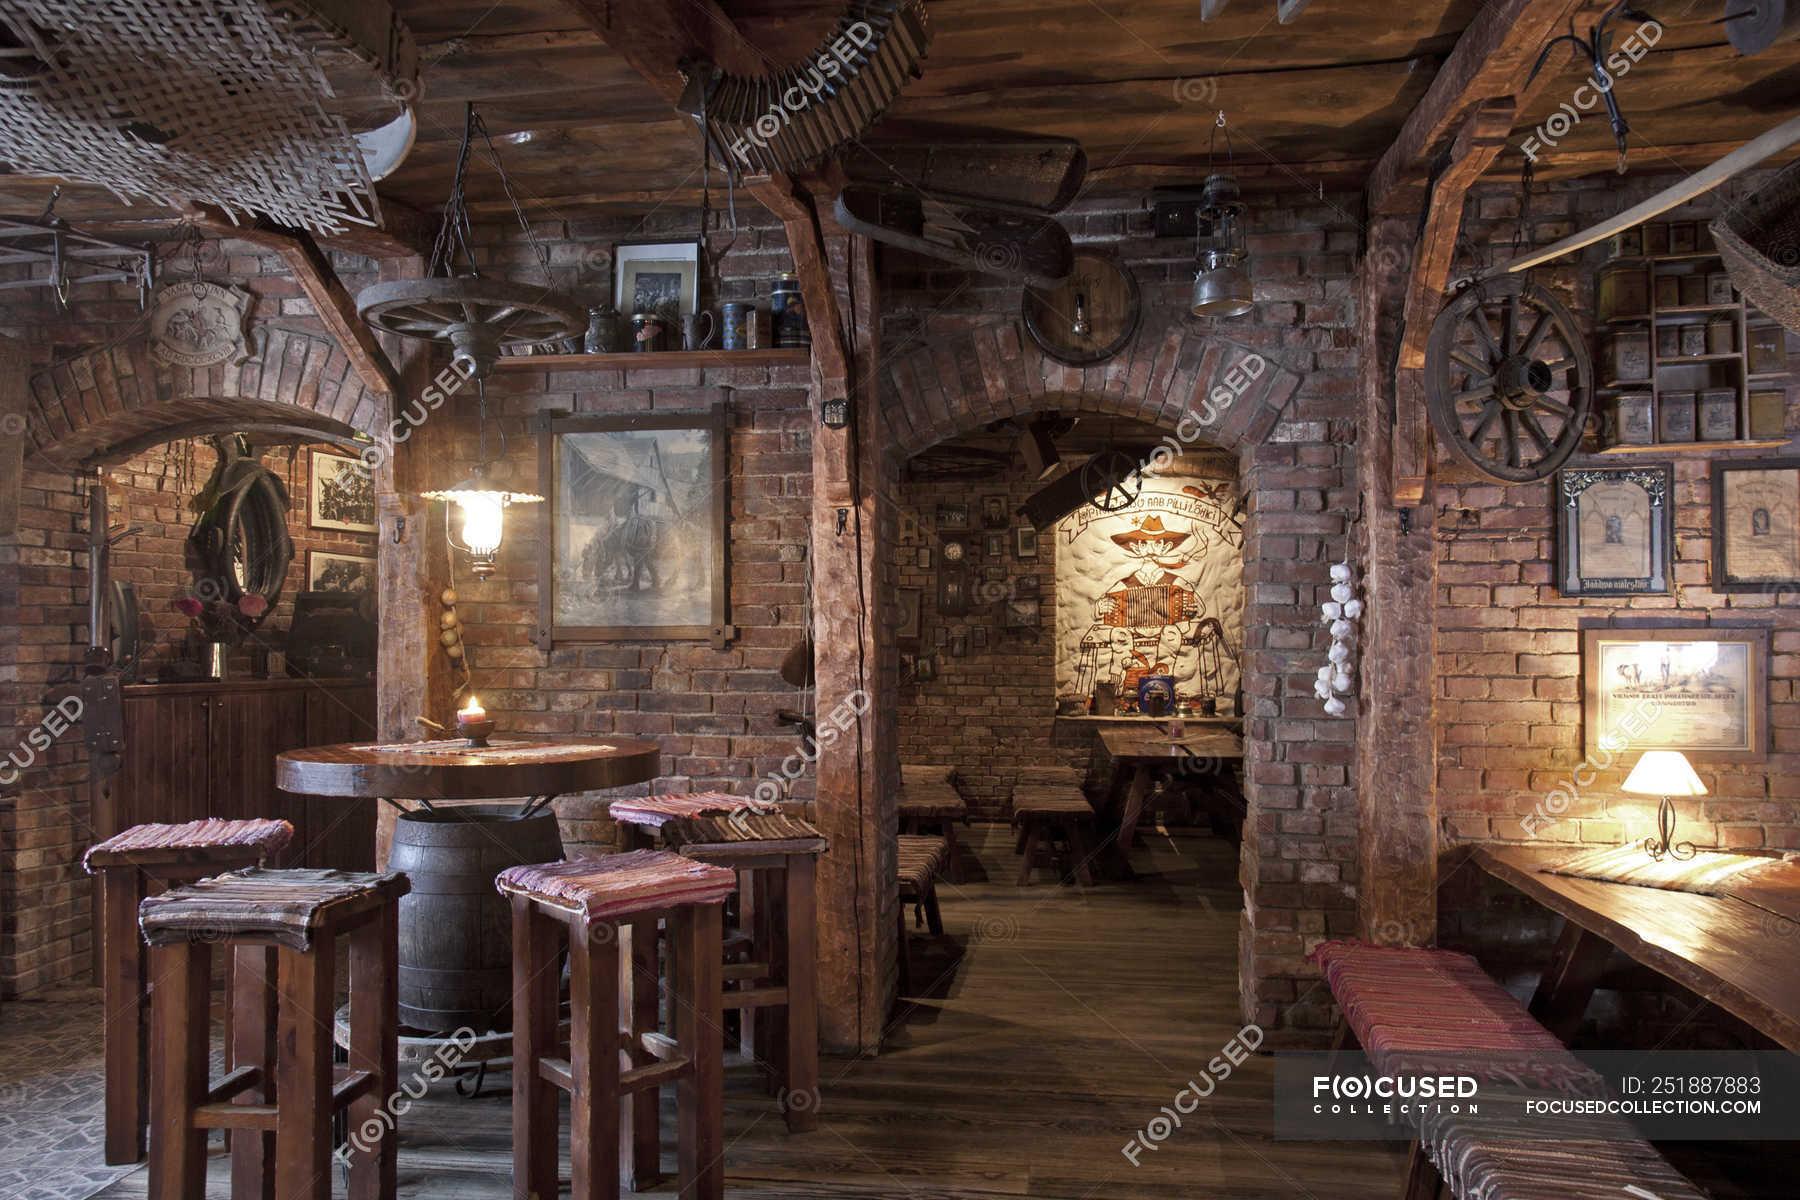 Rustic Restaurant Seating With Brick Walls And Classic Decor Estonia Memorabilia Stock Photo 251887883